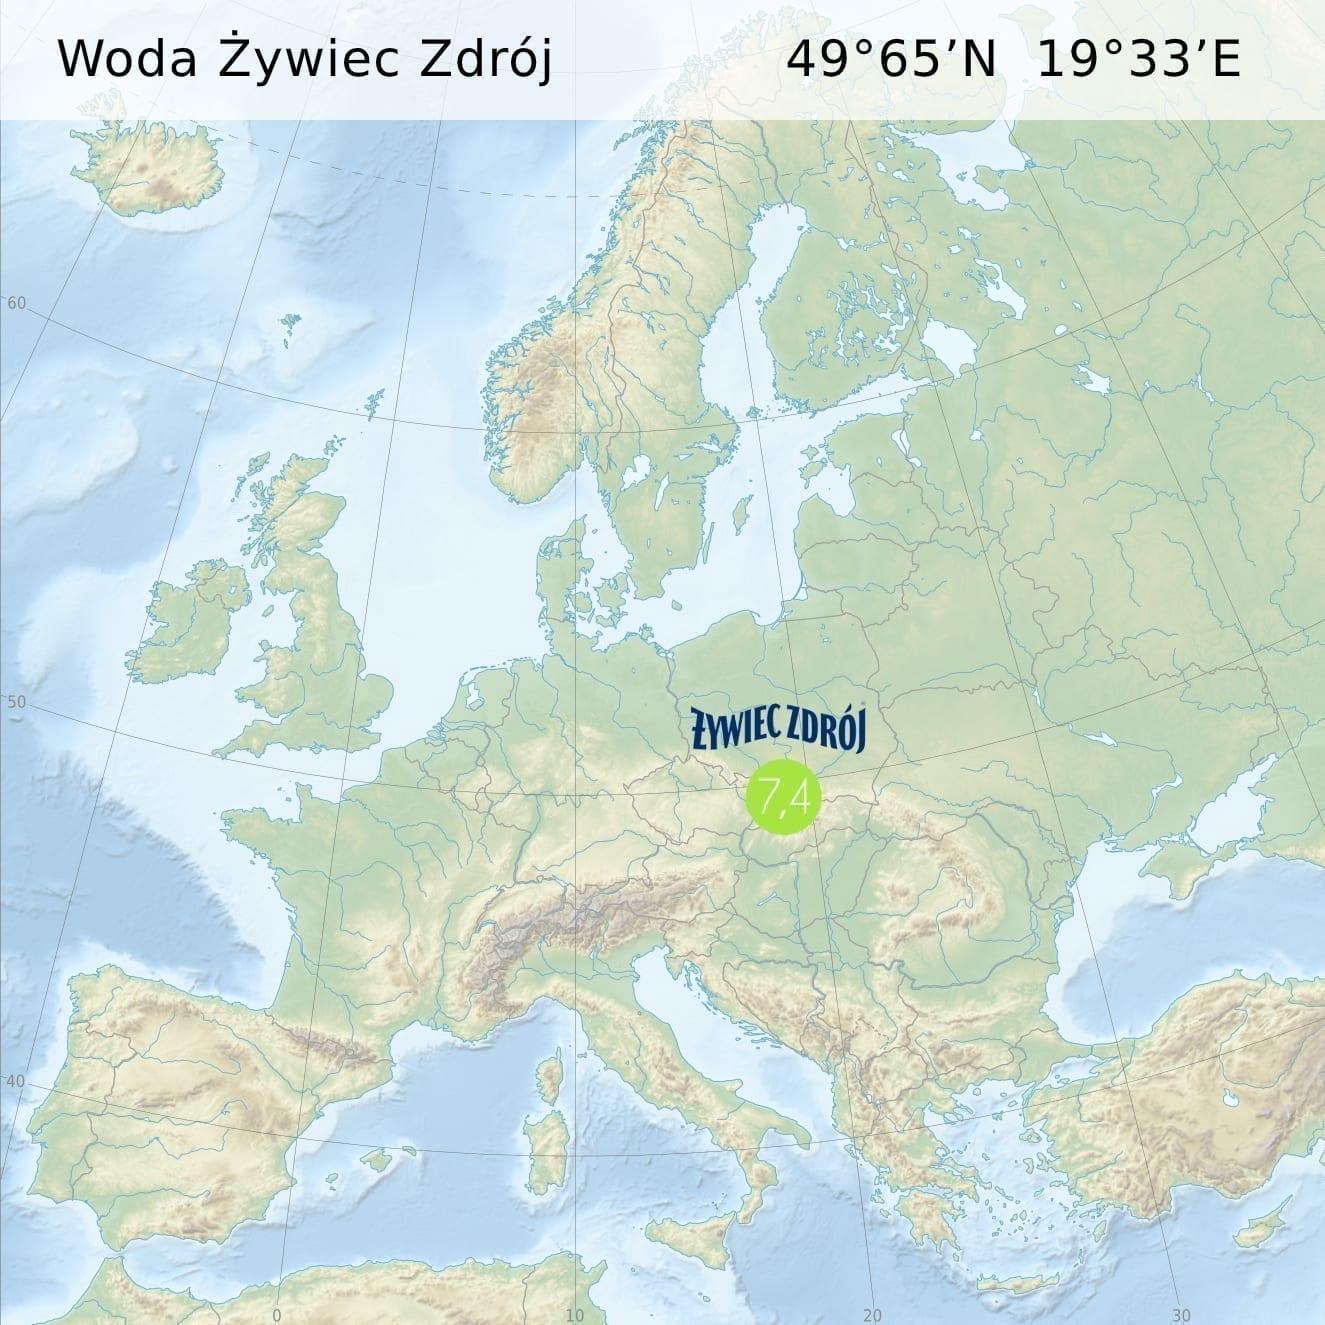 Woda Java źródło Humniska koło Brozowa, Polska